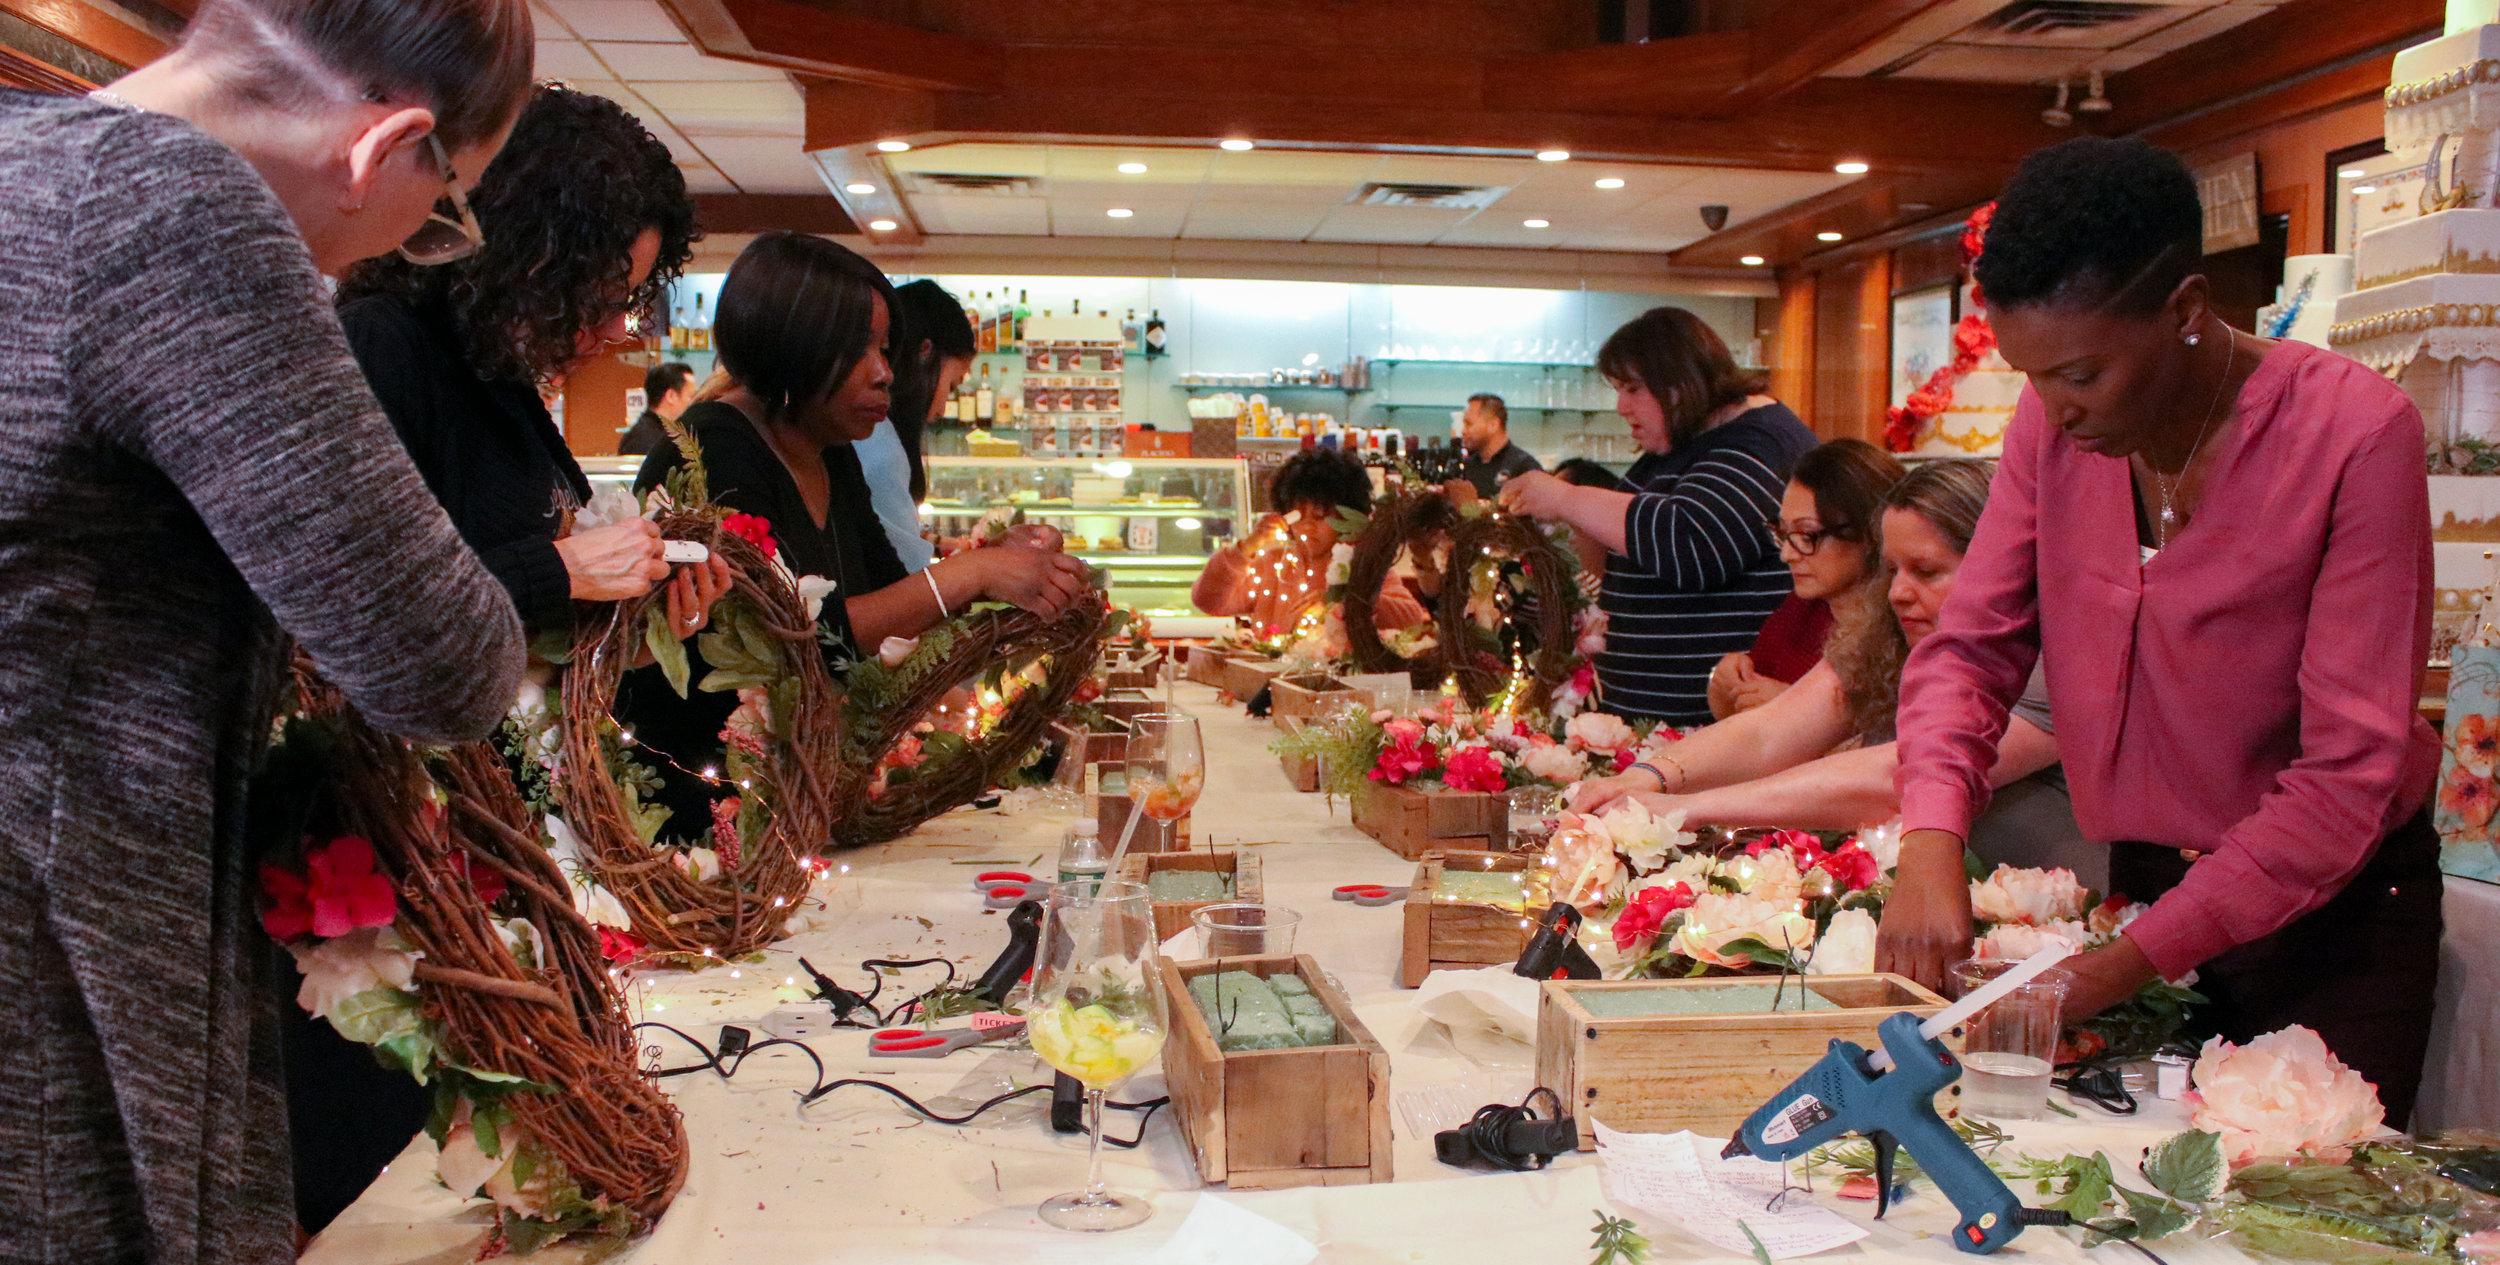 Host a DIY Workshop | Simply Handmade Studios